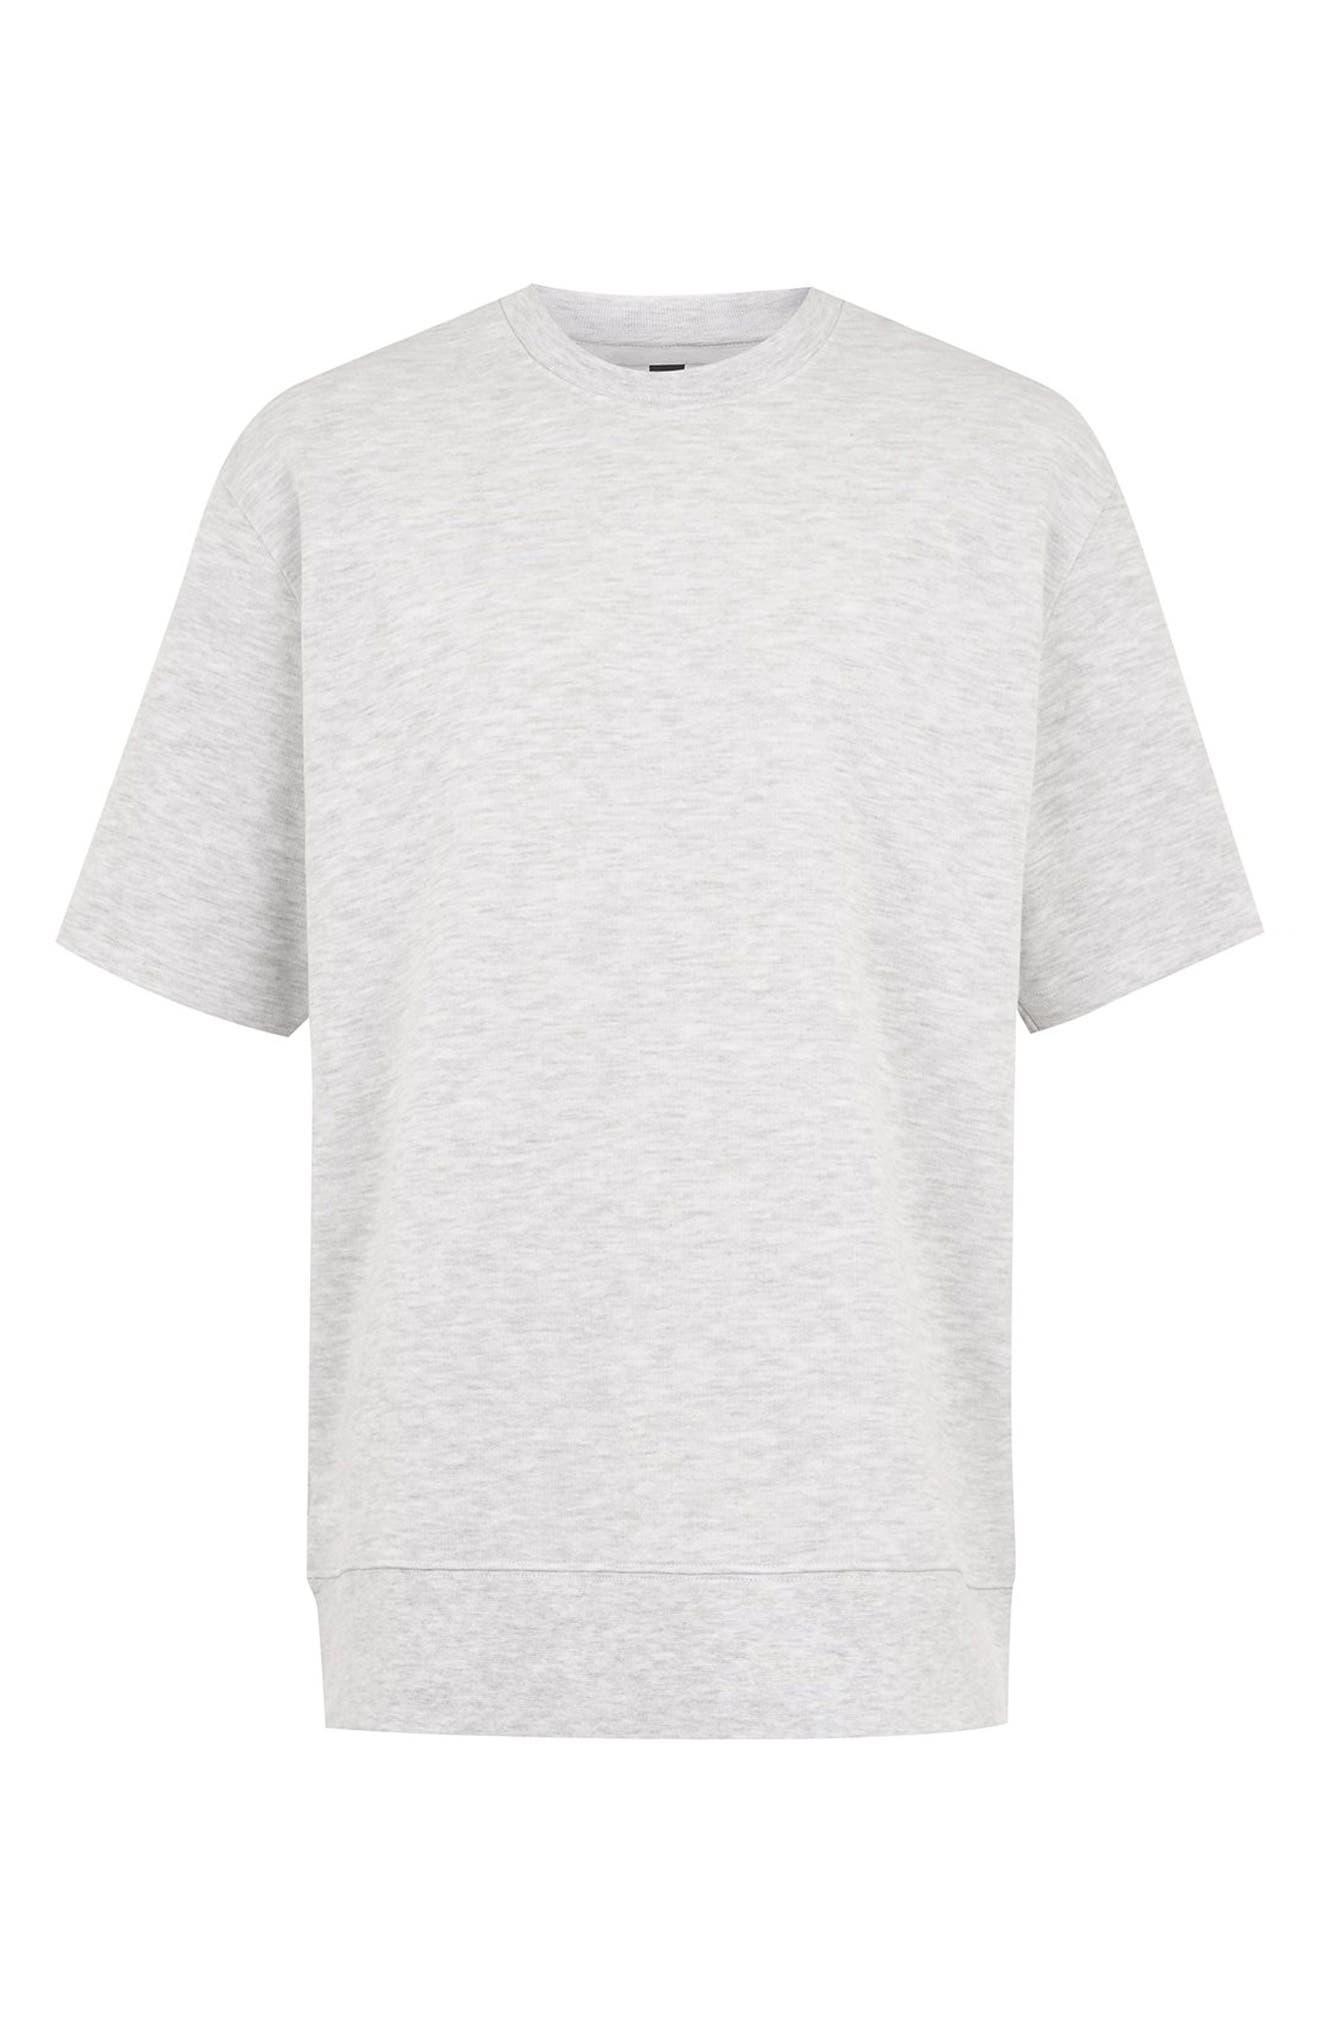 Short Sleeve Crewneck Sweatshirt,                             Alternate thumbnail 4, color,                             LIGHT GREY